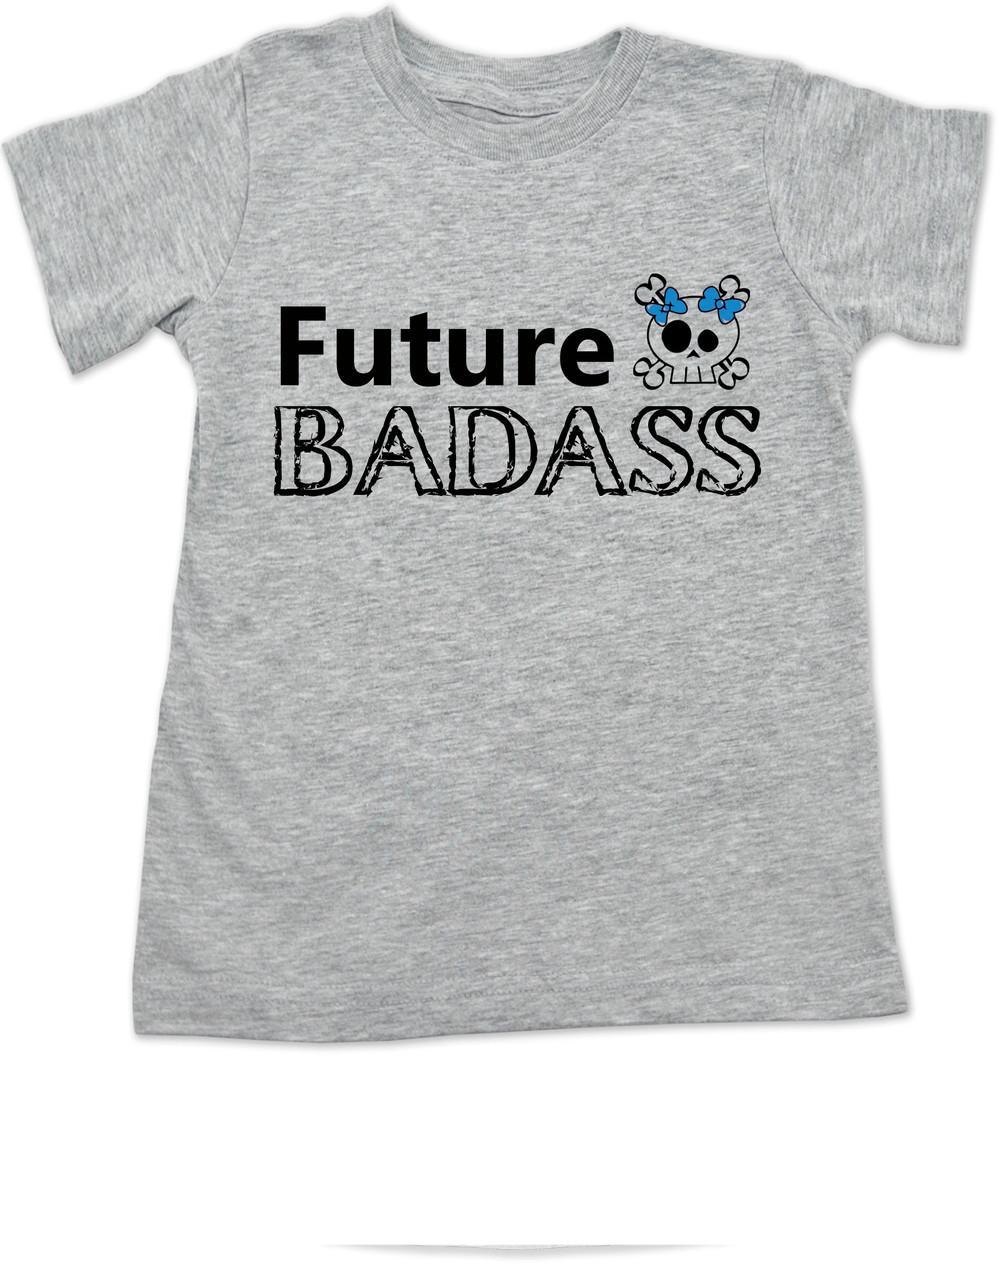 Personalised Name T-Shirts /& Bodysuits Printed Baby Toddler Matching Girls Boys